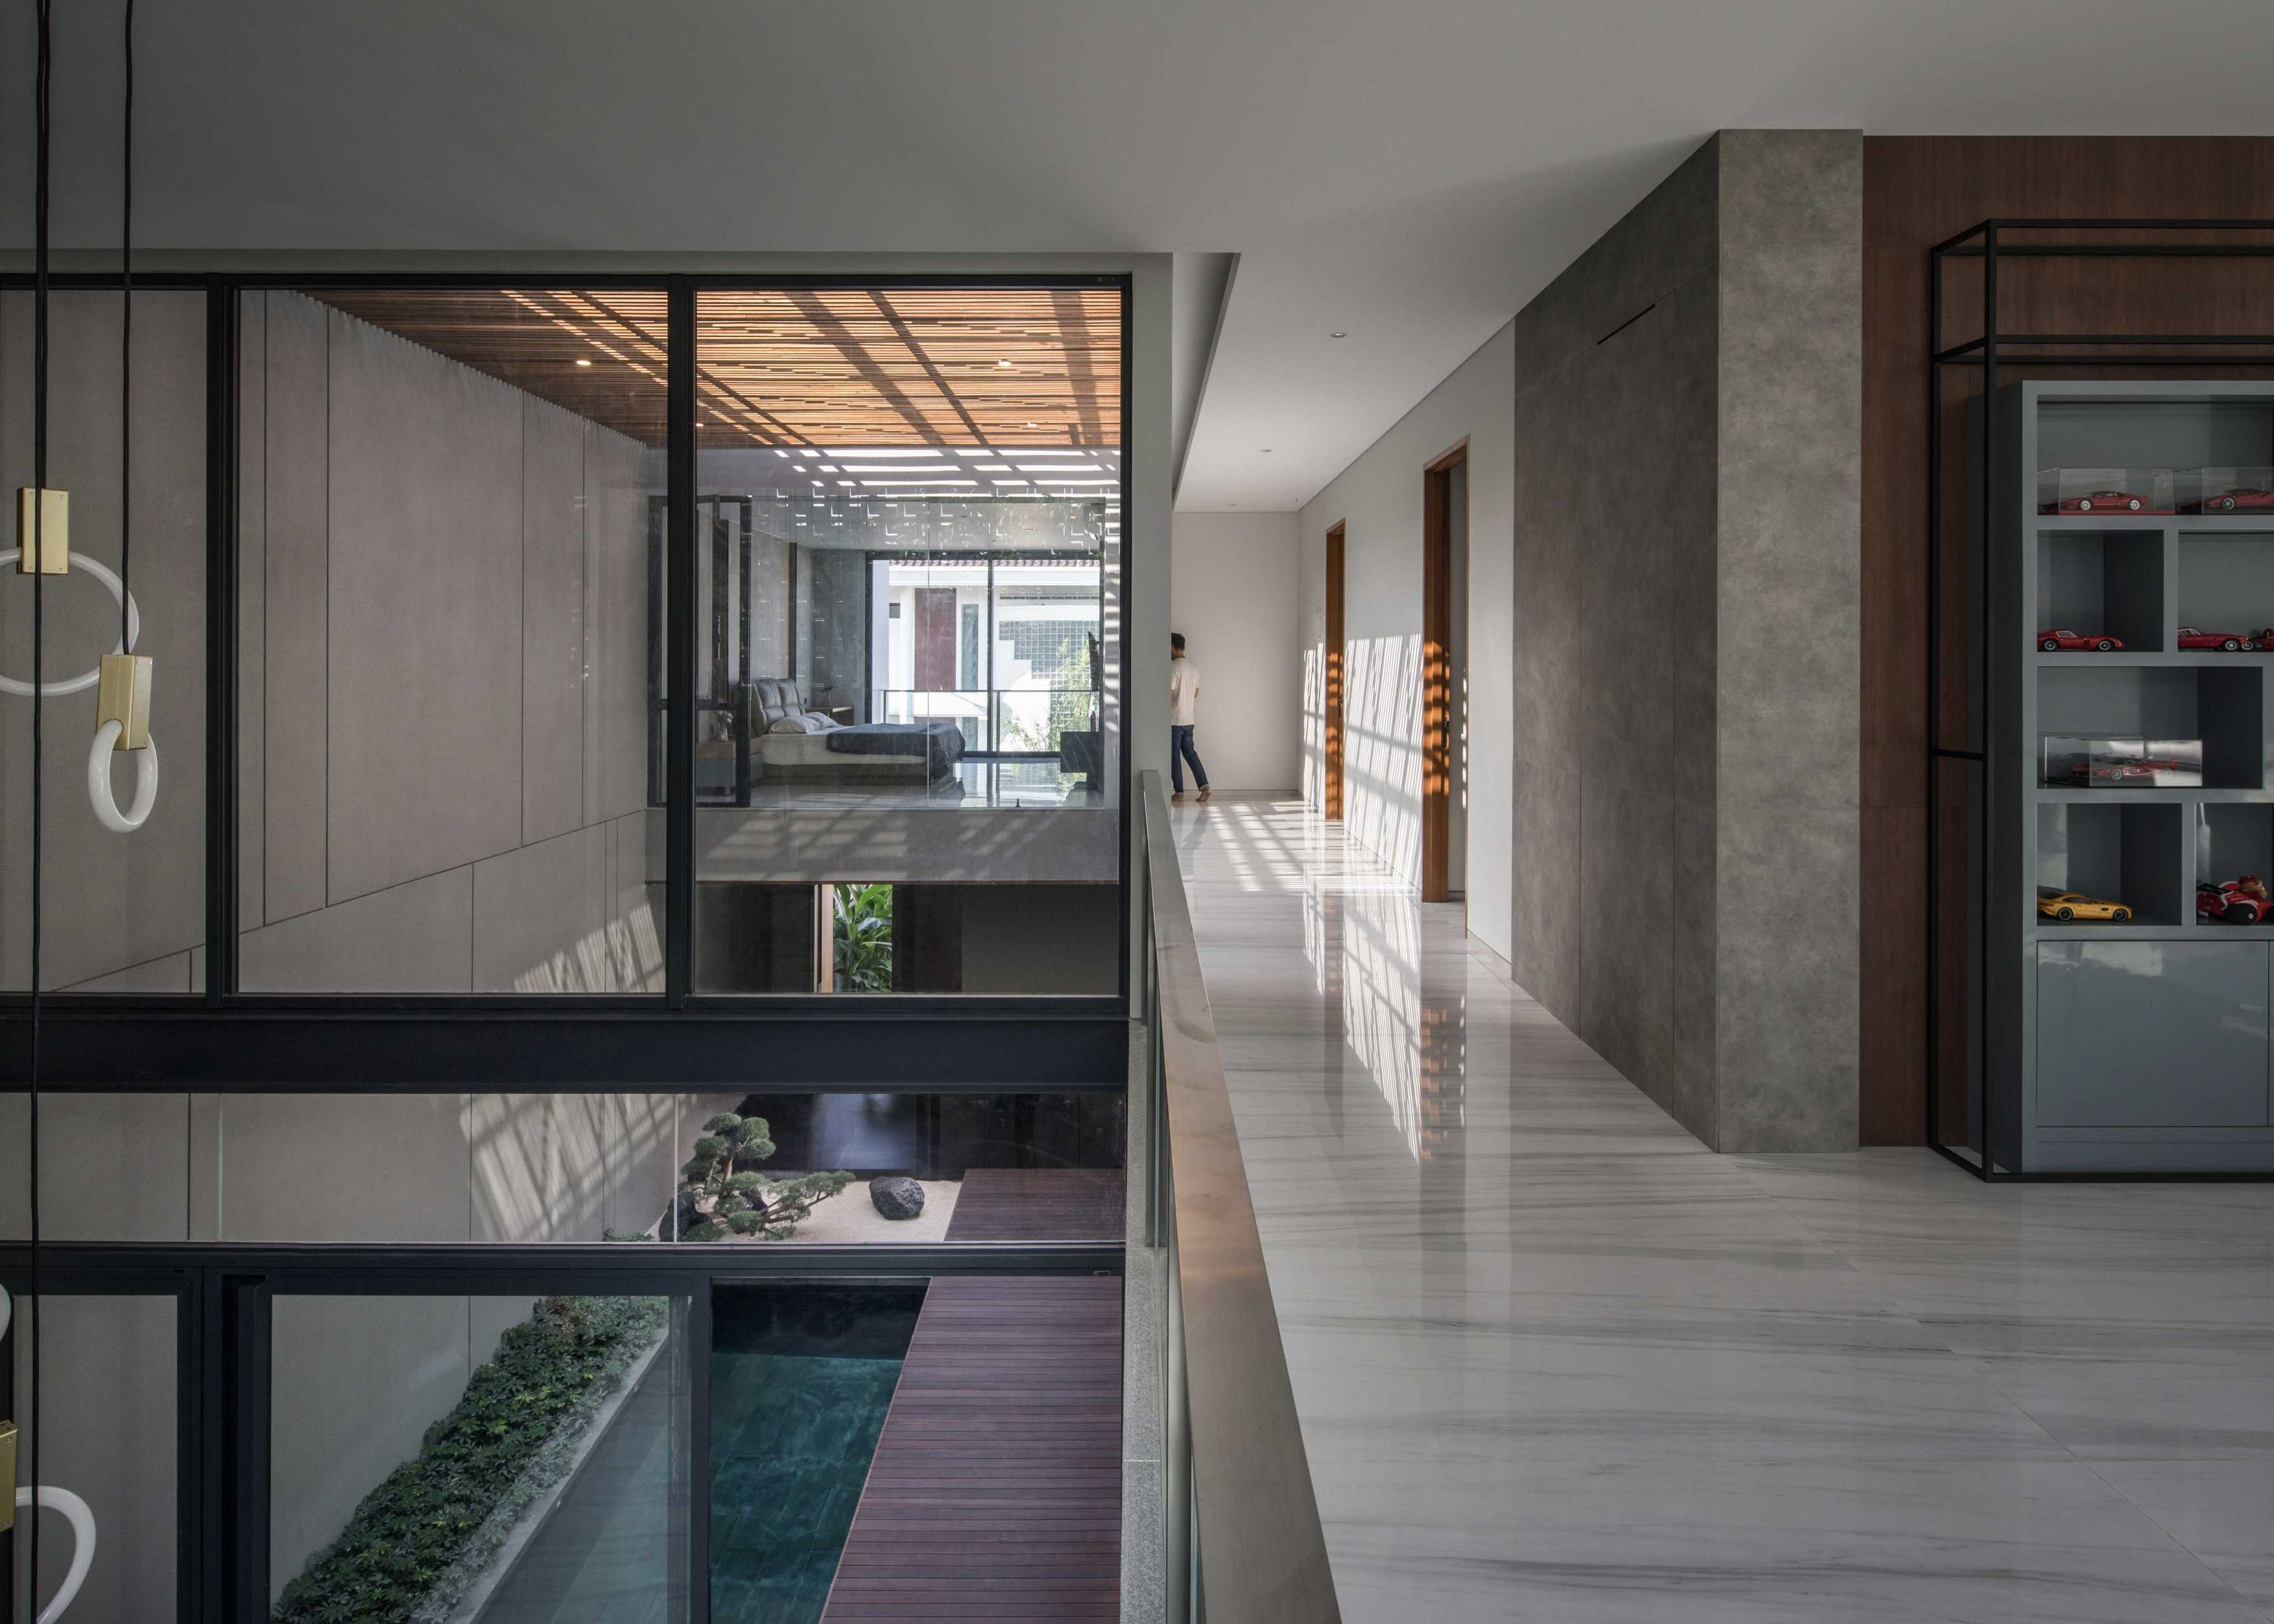 Rakta Studio Rr House Bandung, Kota Bandung, Jawa Barat, Indonesia Bandung, Kota Bandung, Jawa Barat, Indonesia Rakta-Studio-Rr-House   102333